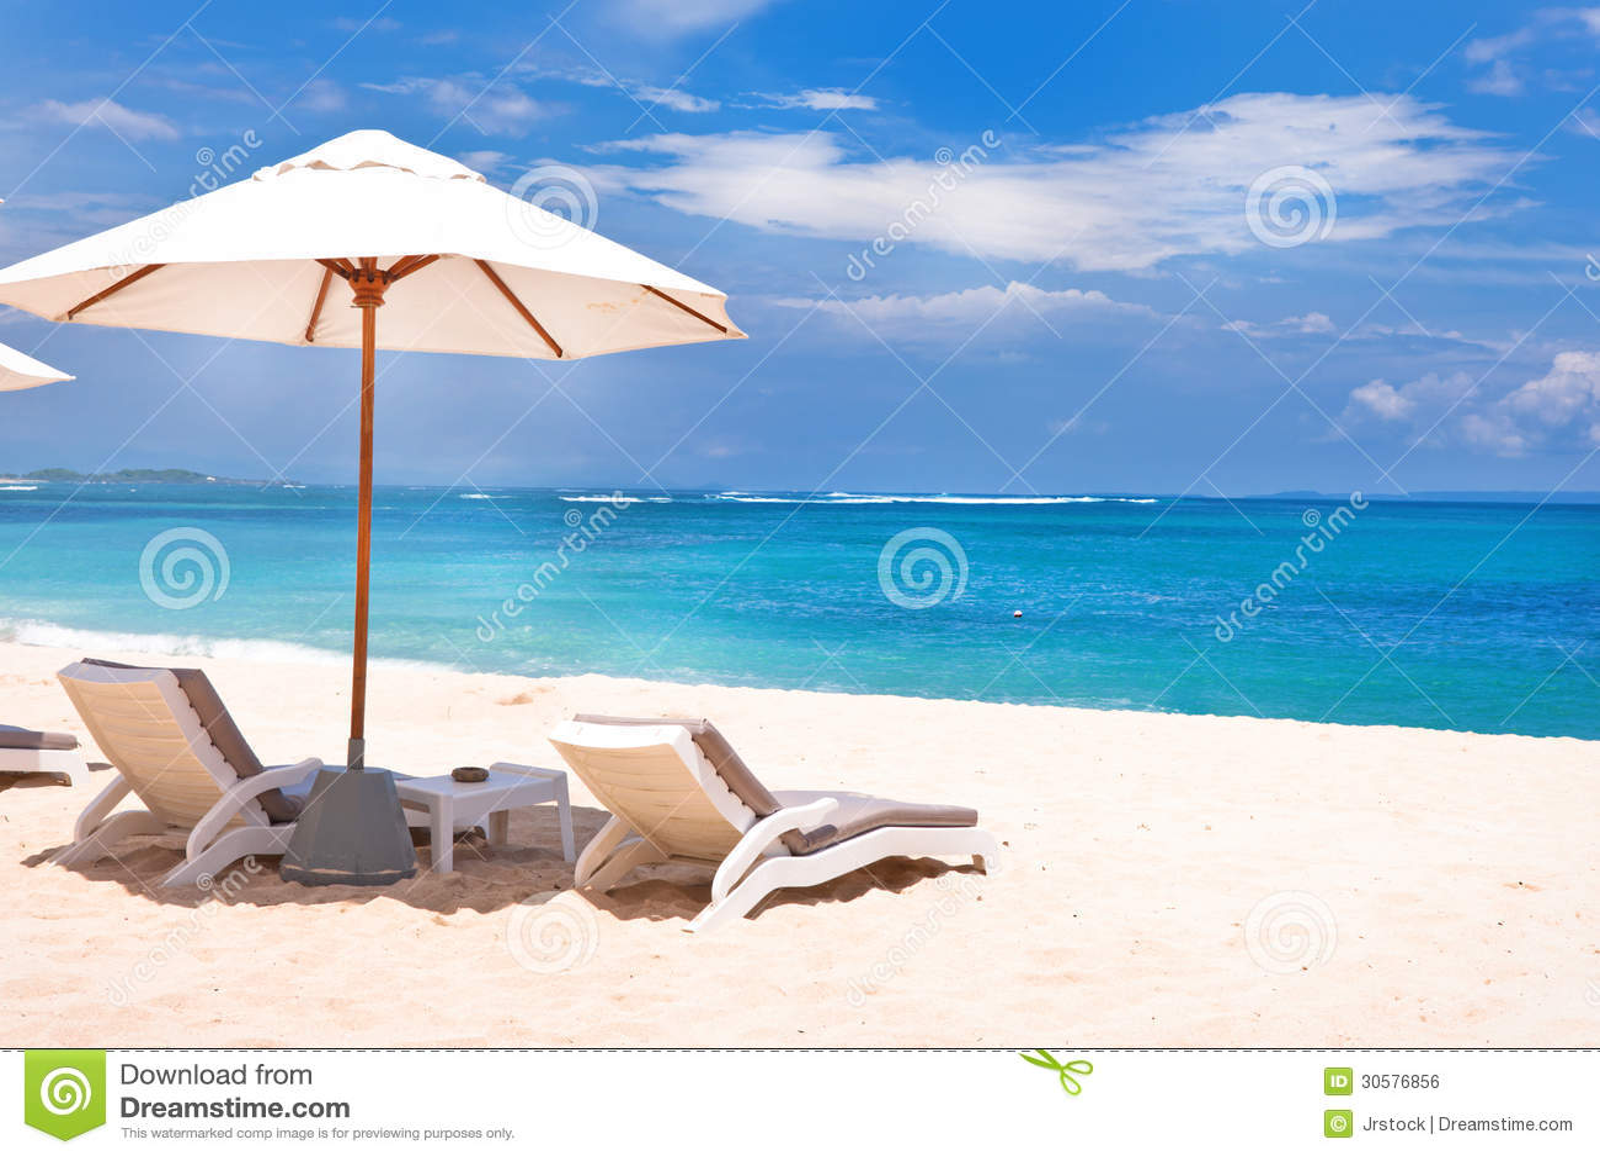 Suggestive Beach Scene Stock Photo Image Of Summer Umbrella 30576856